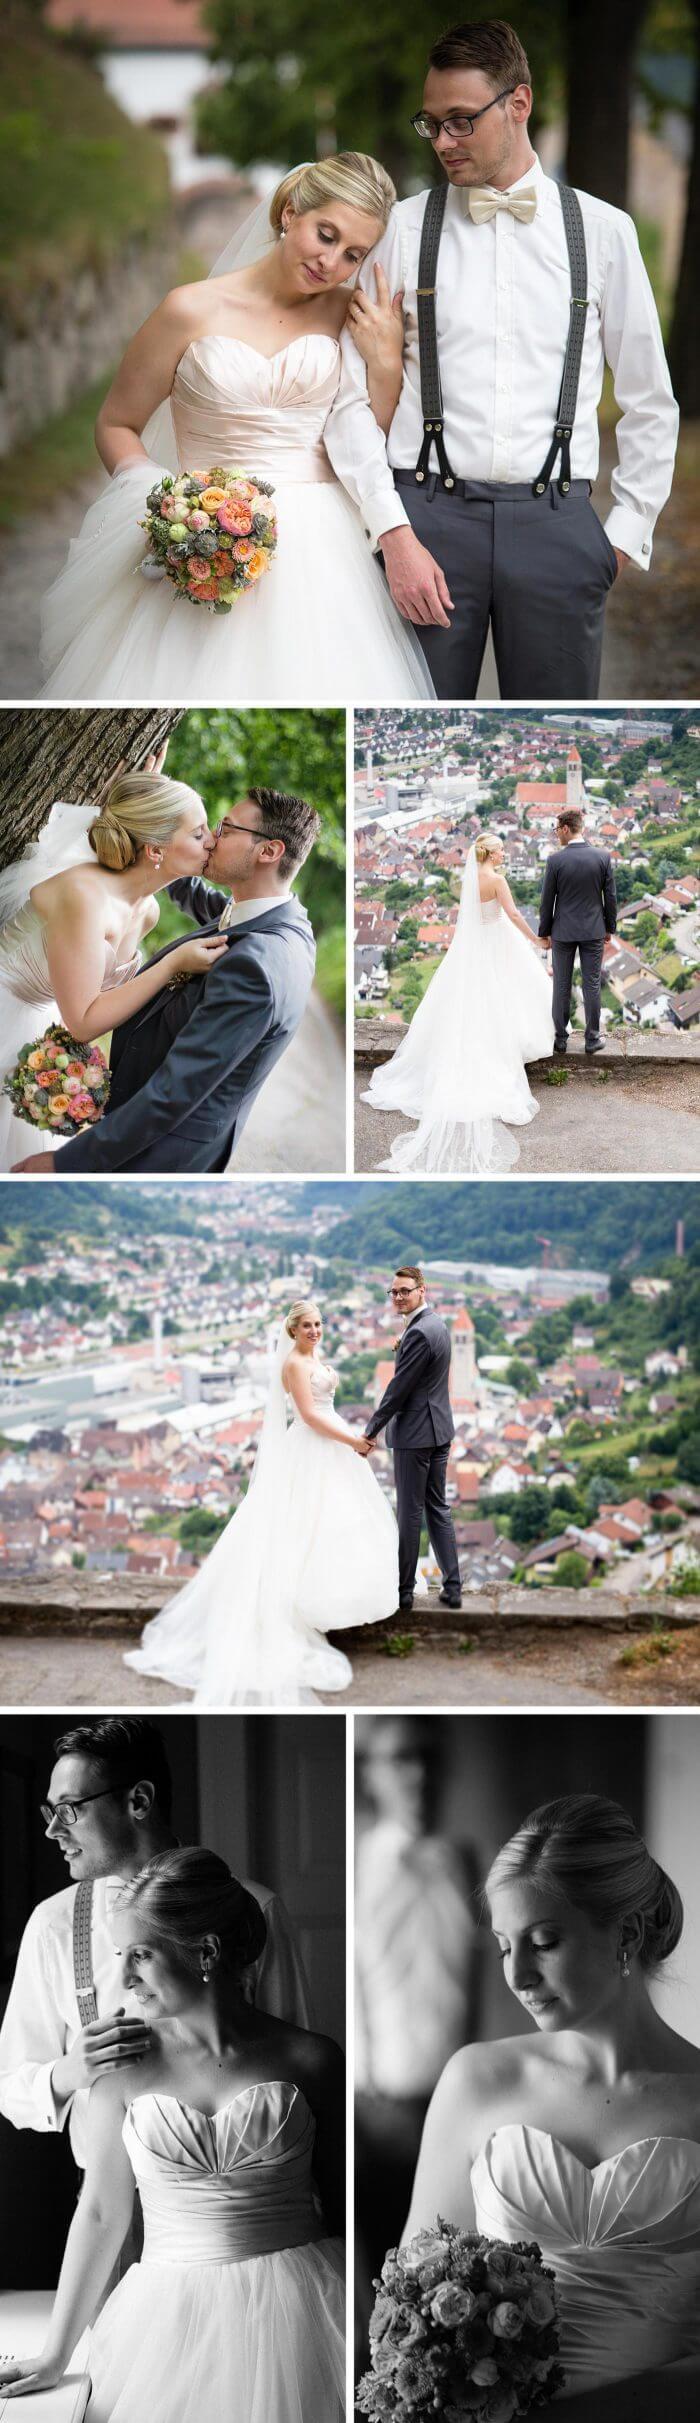 Heiraten Schloss Eberstein